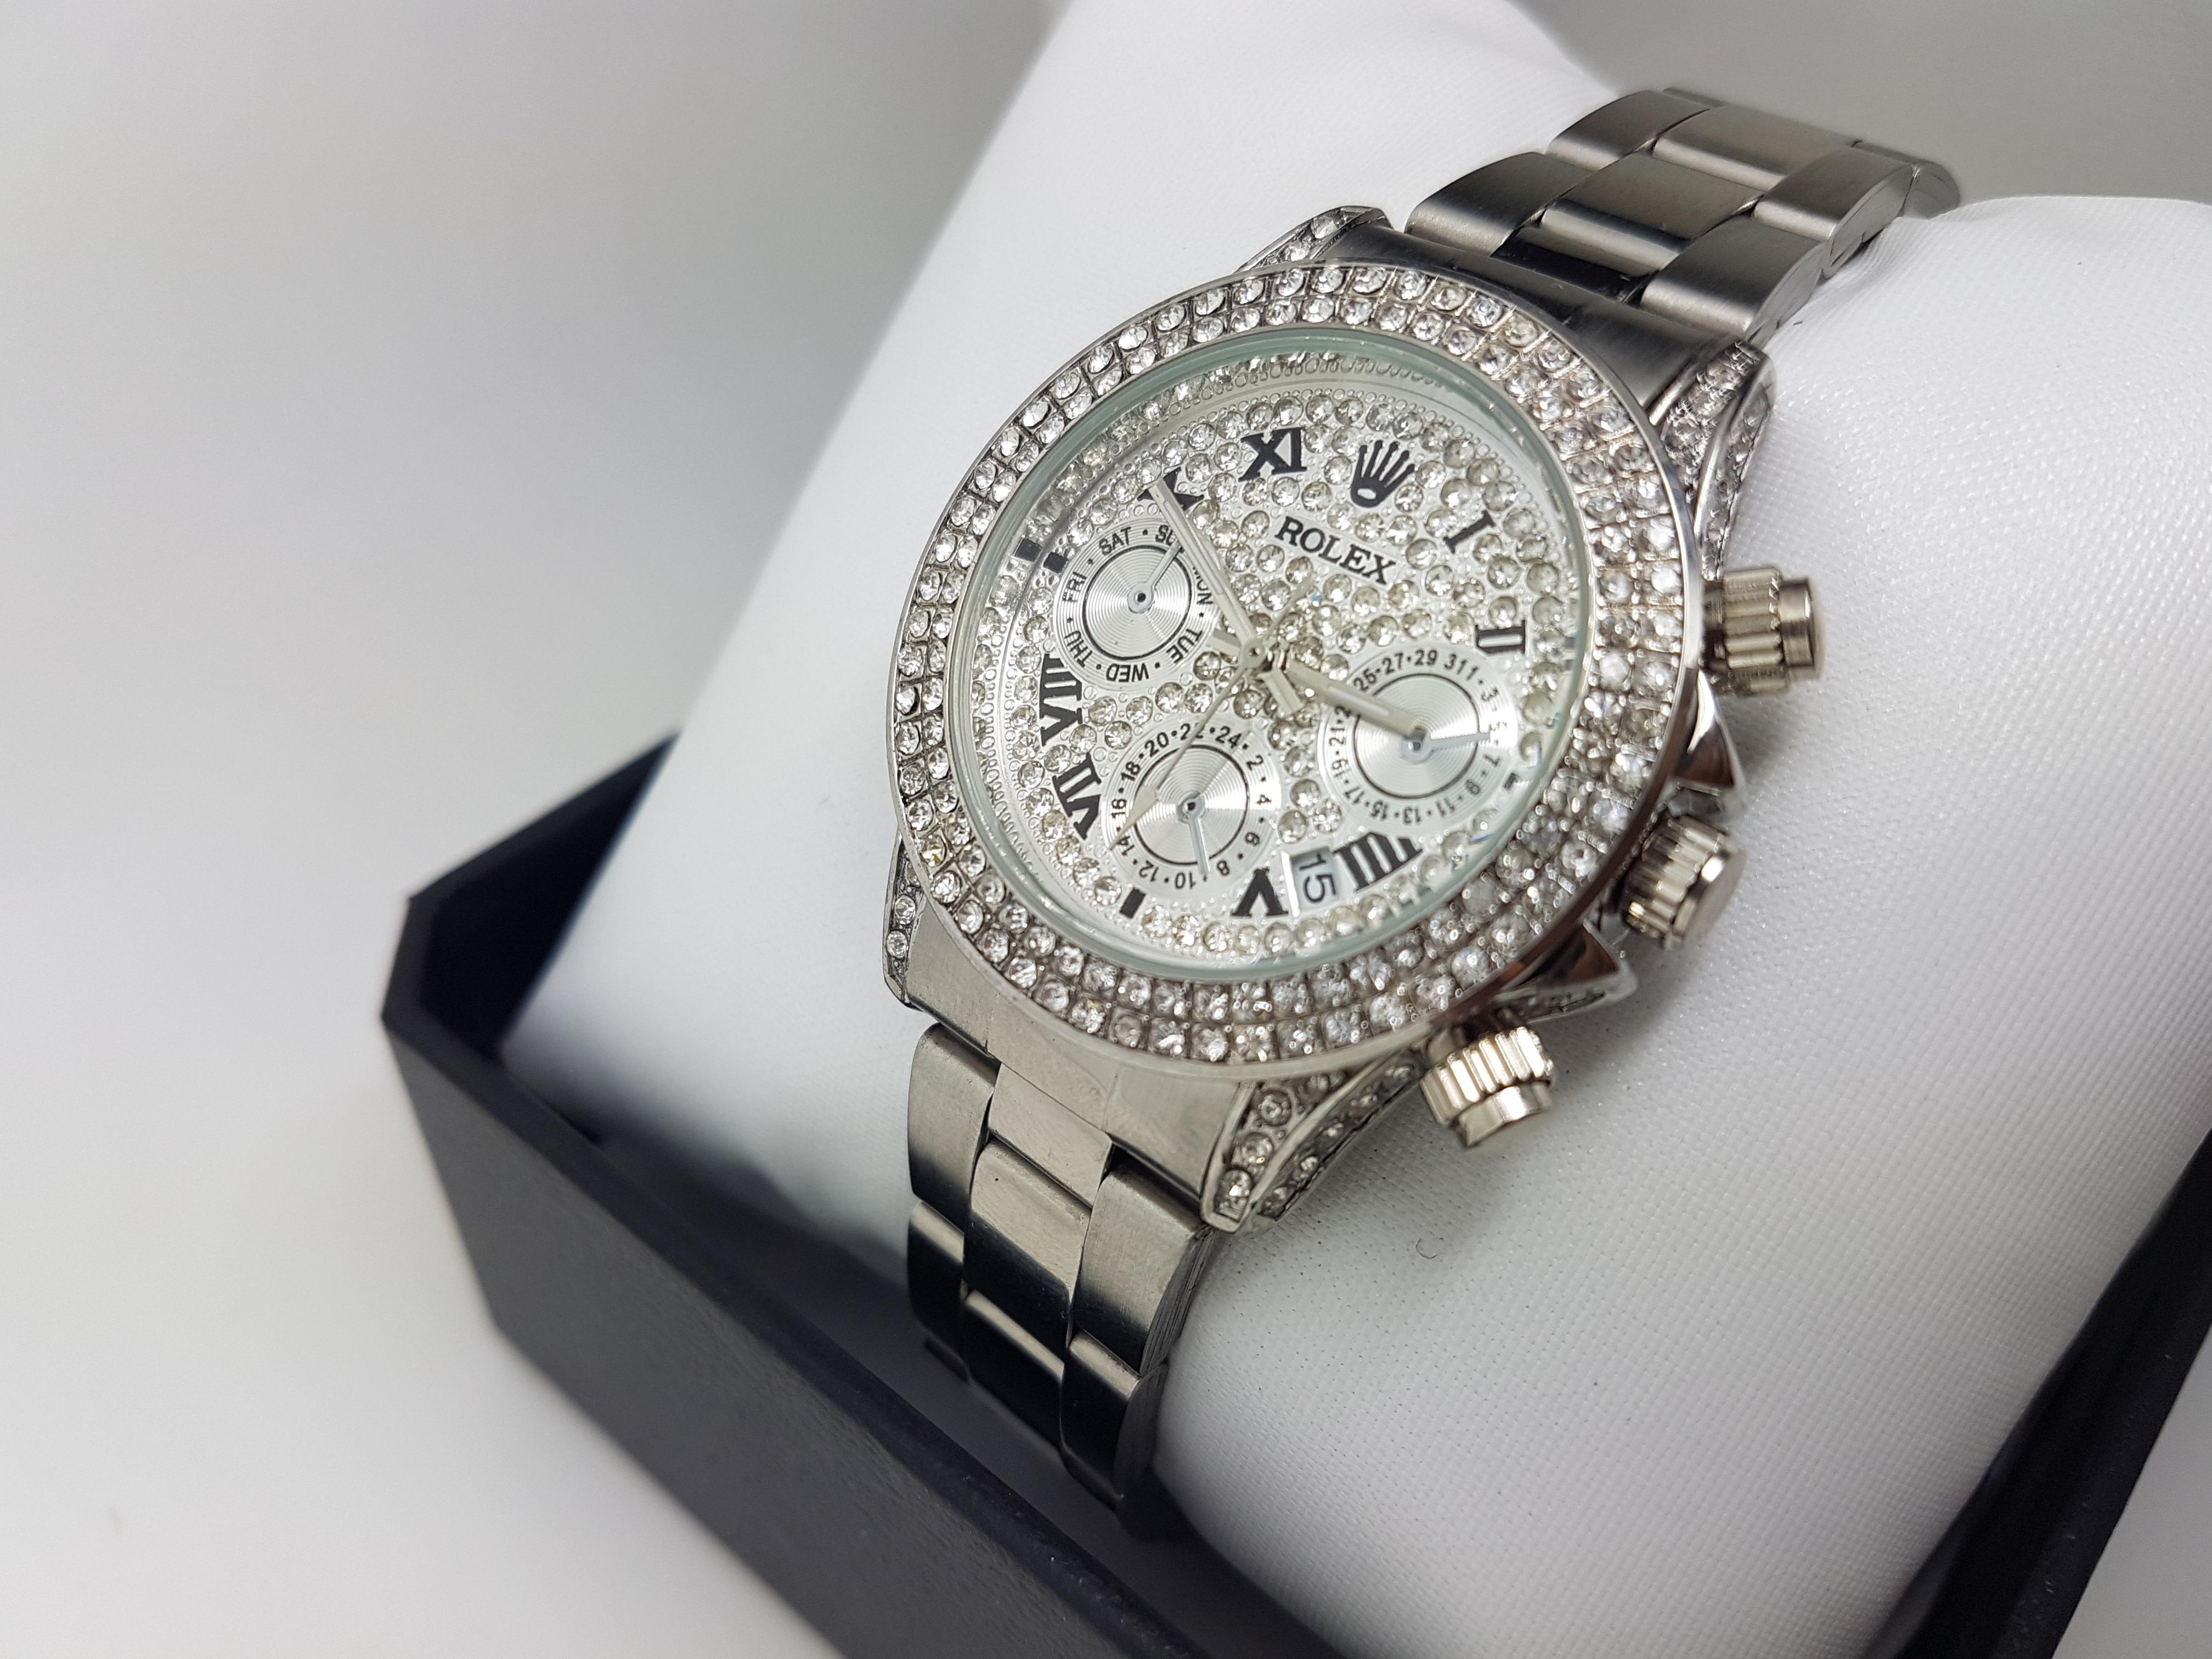 Elegant Mens Shiny Chain Watch with Diamonds